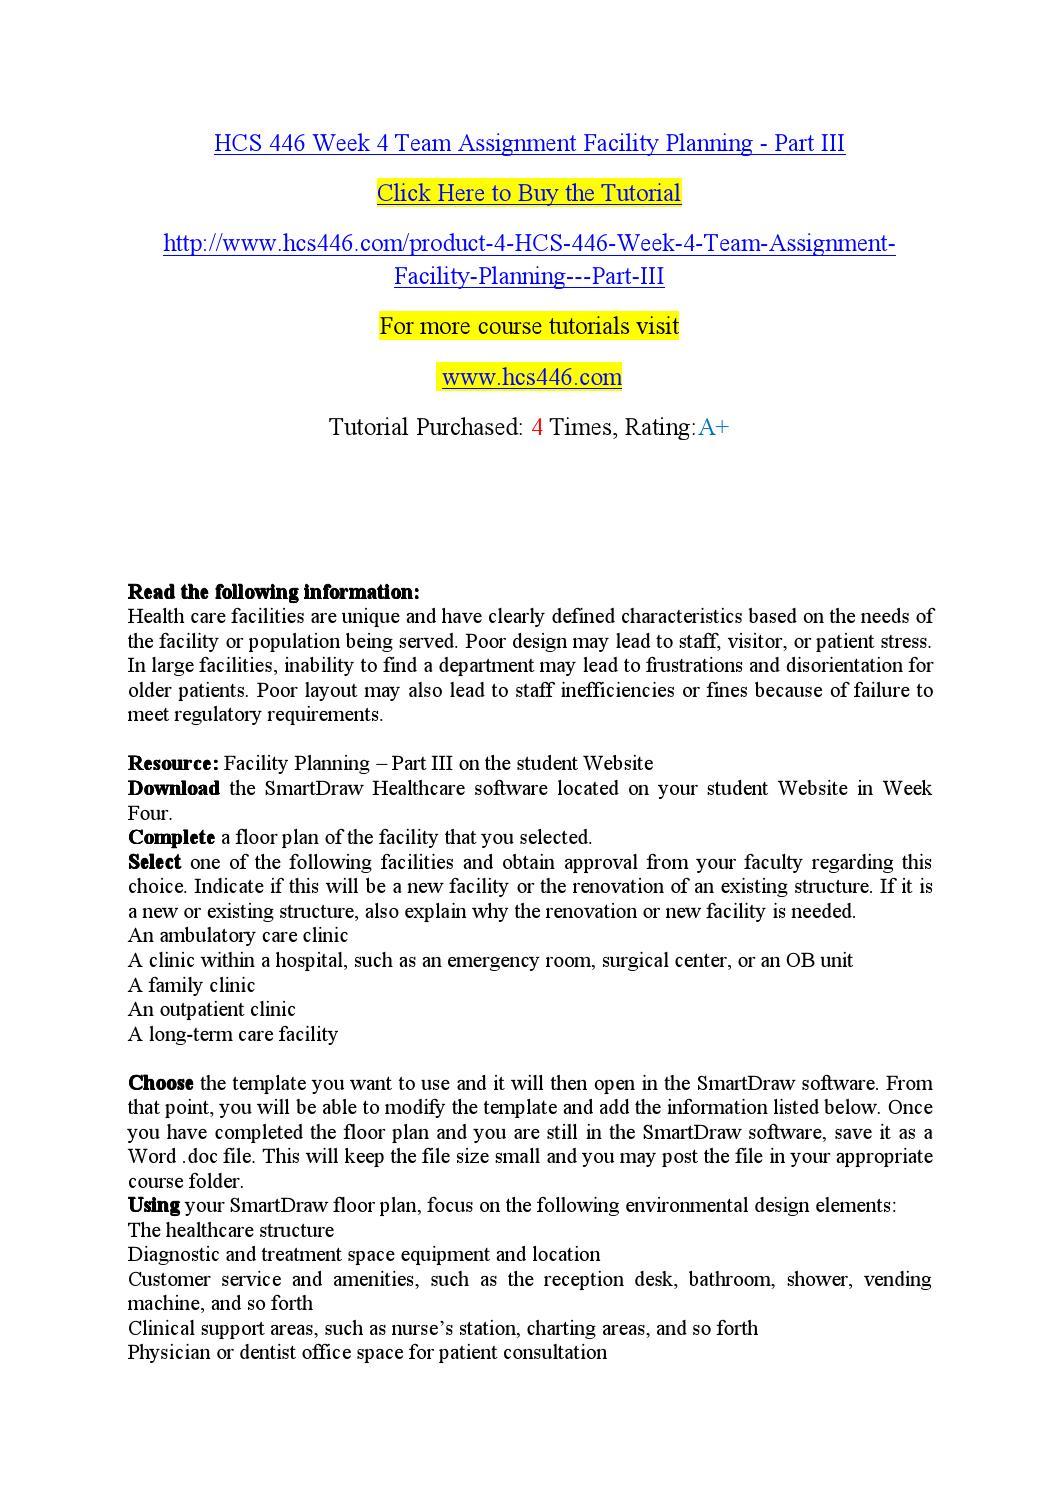 Hcs 446 week 3 Custom paper Academic Writing Service - July 2019